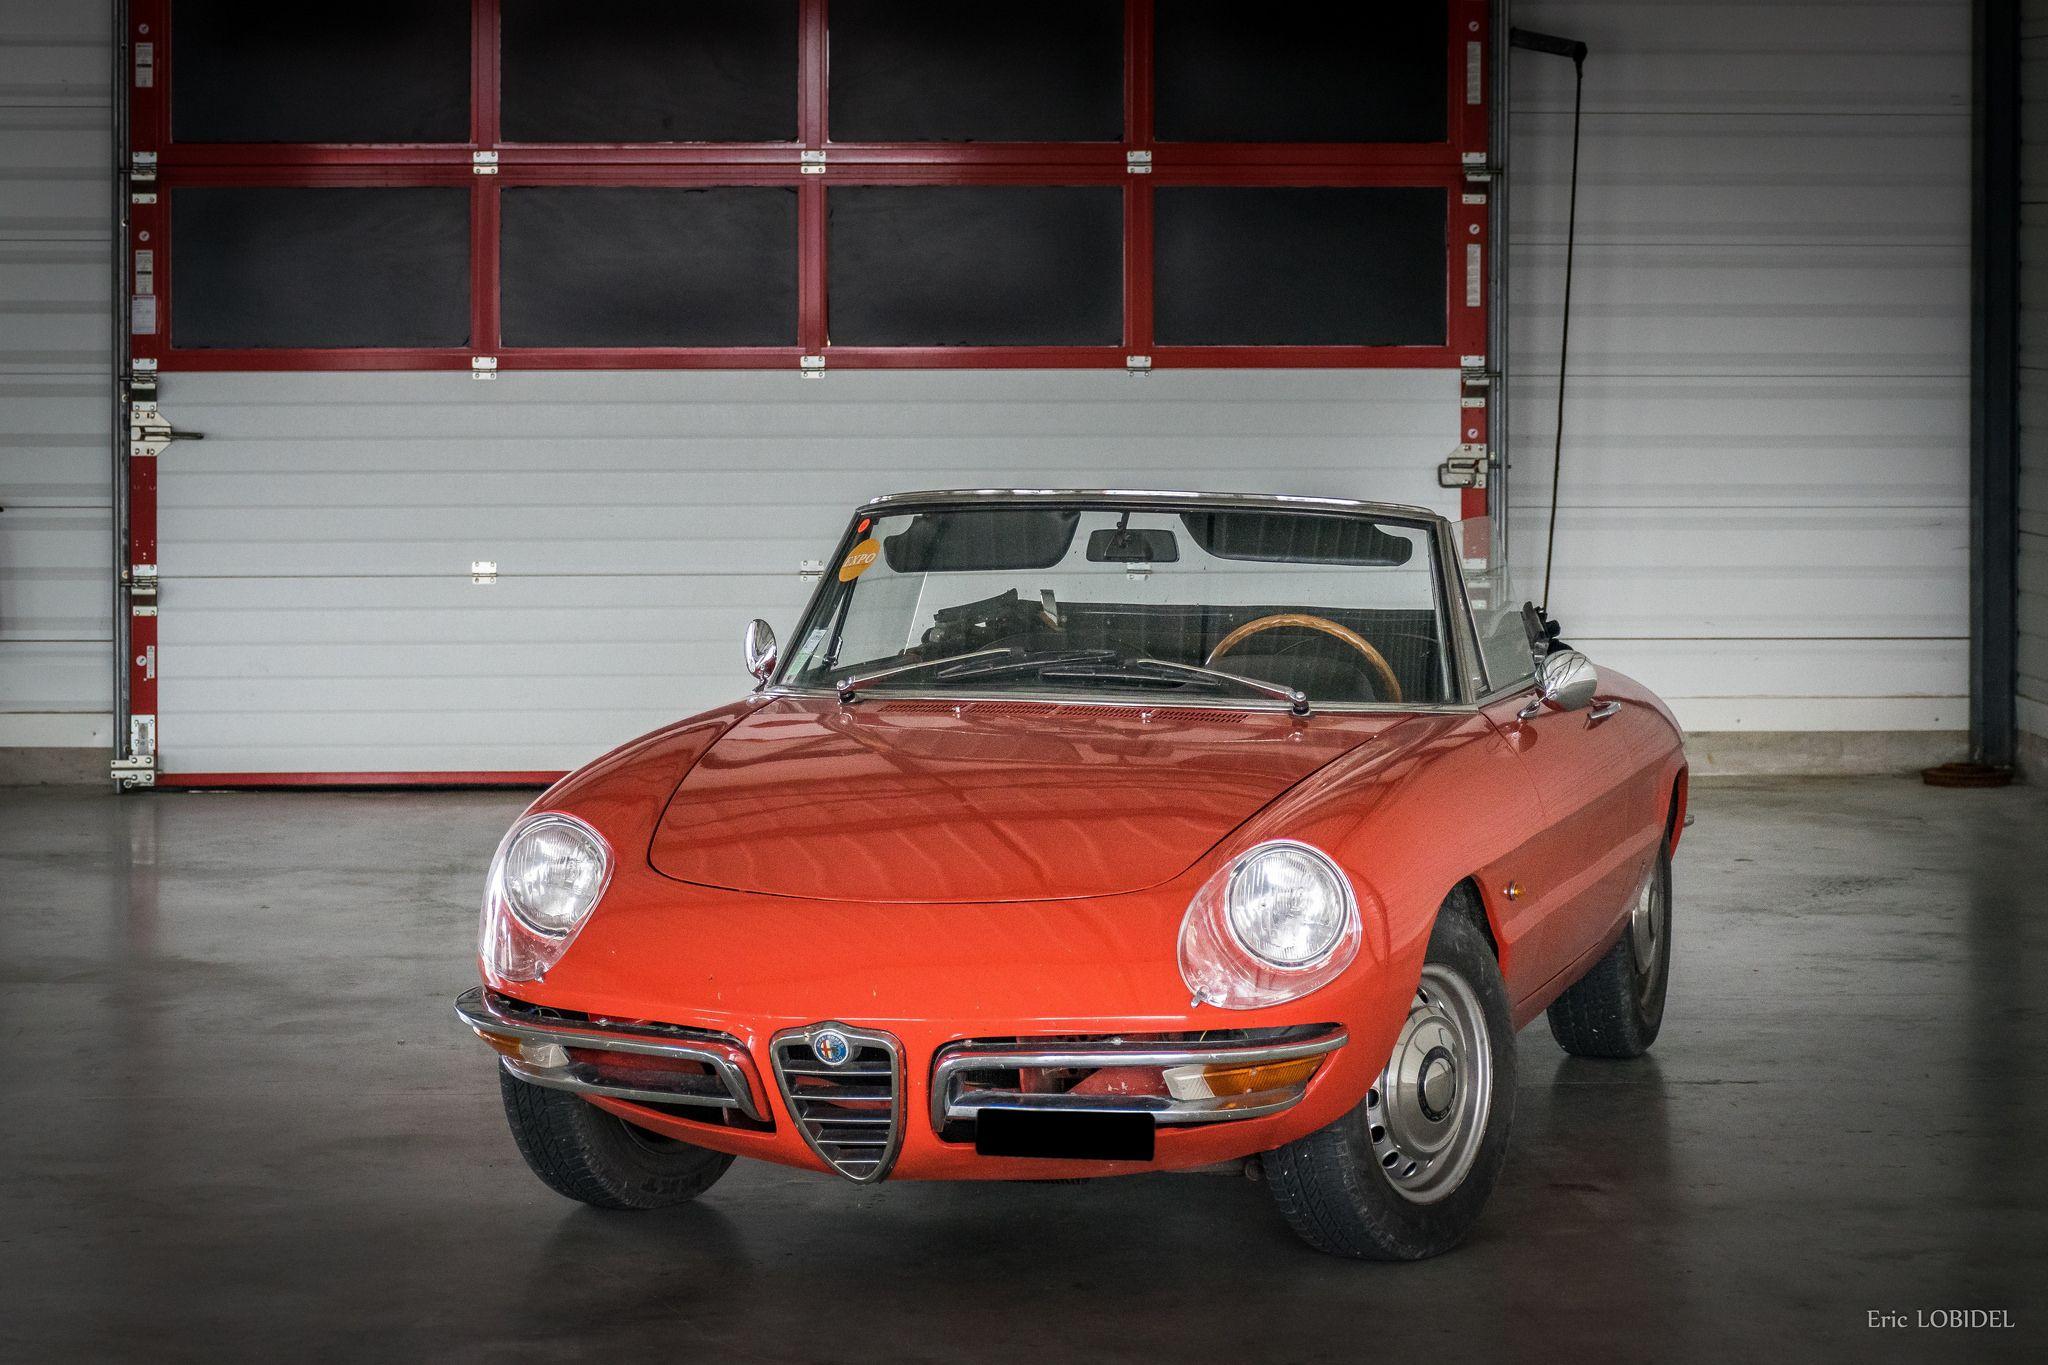 21062015 Dsc 0223 2 Alfa Romeo Spider Alfa Romeo Cars Alfa Romeo